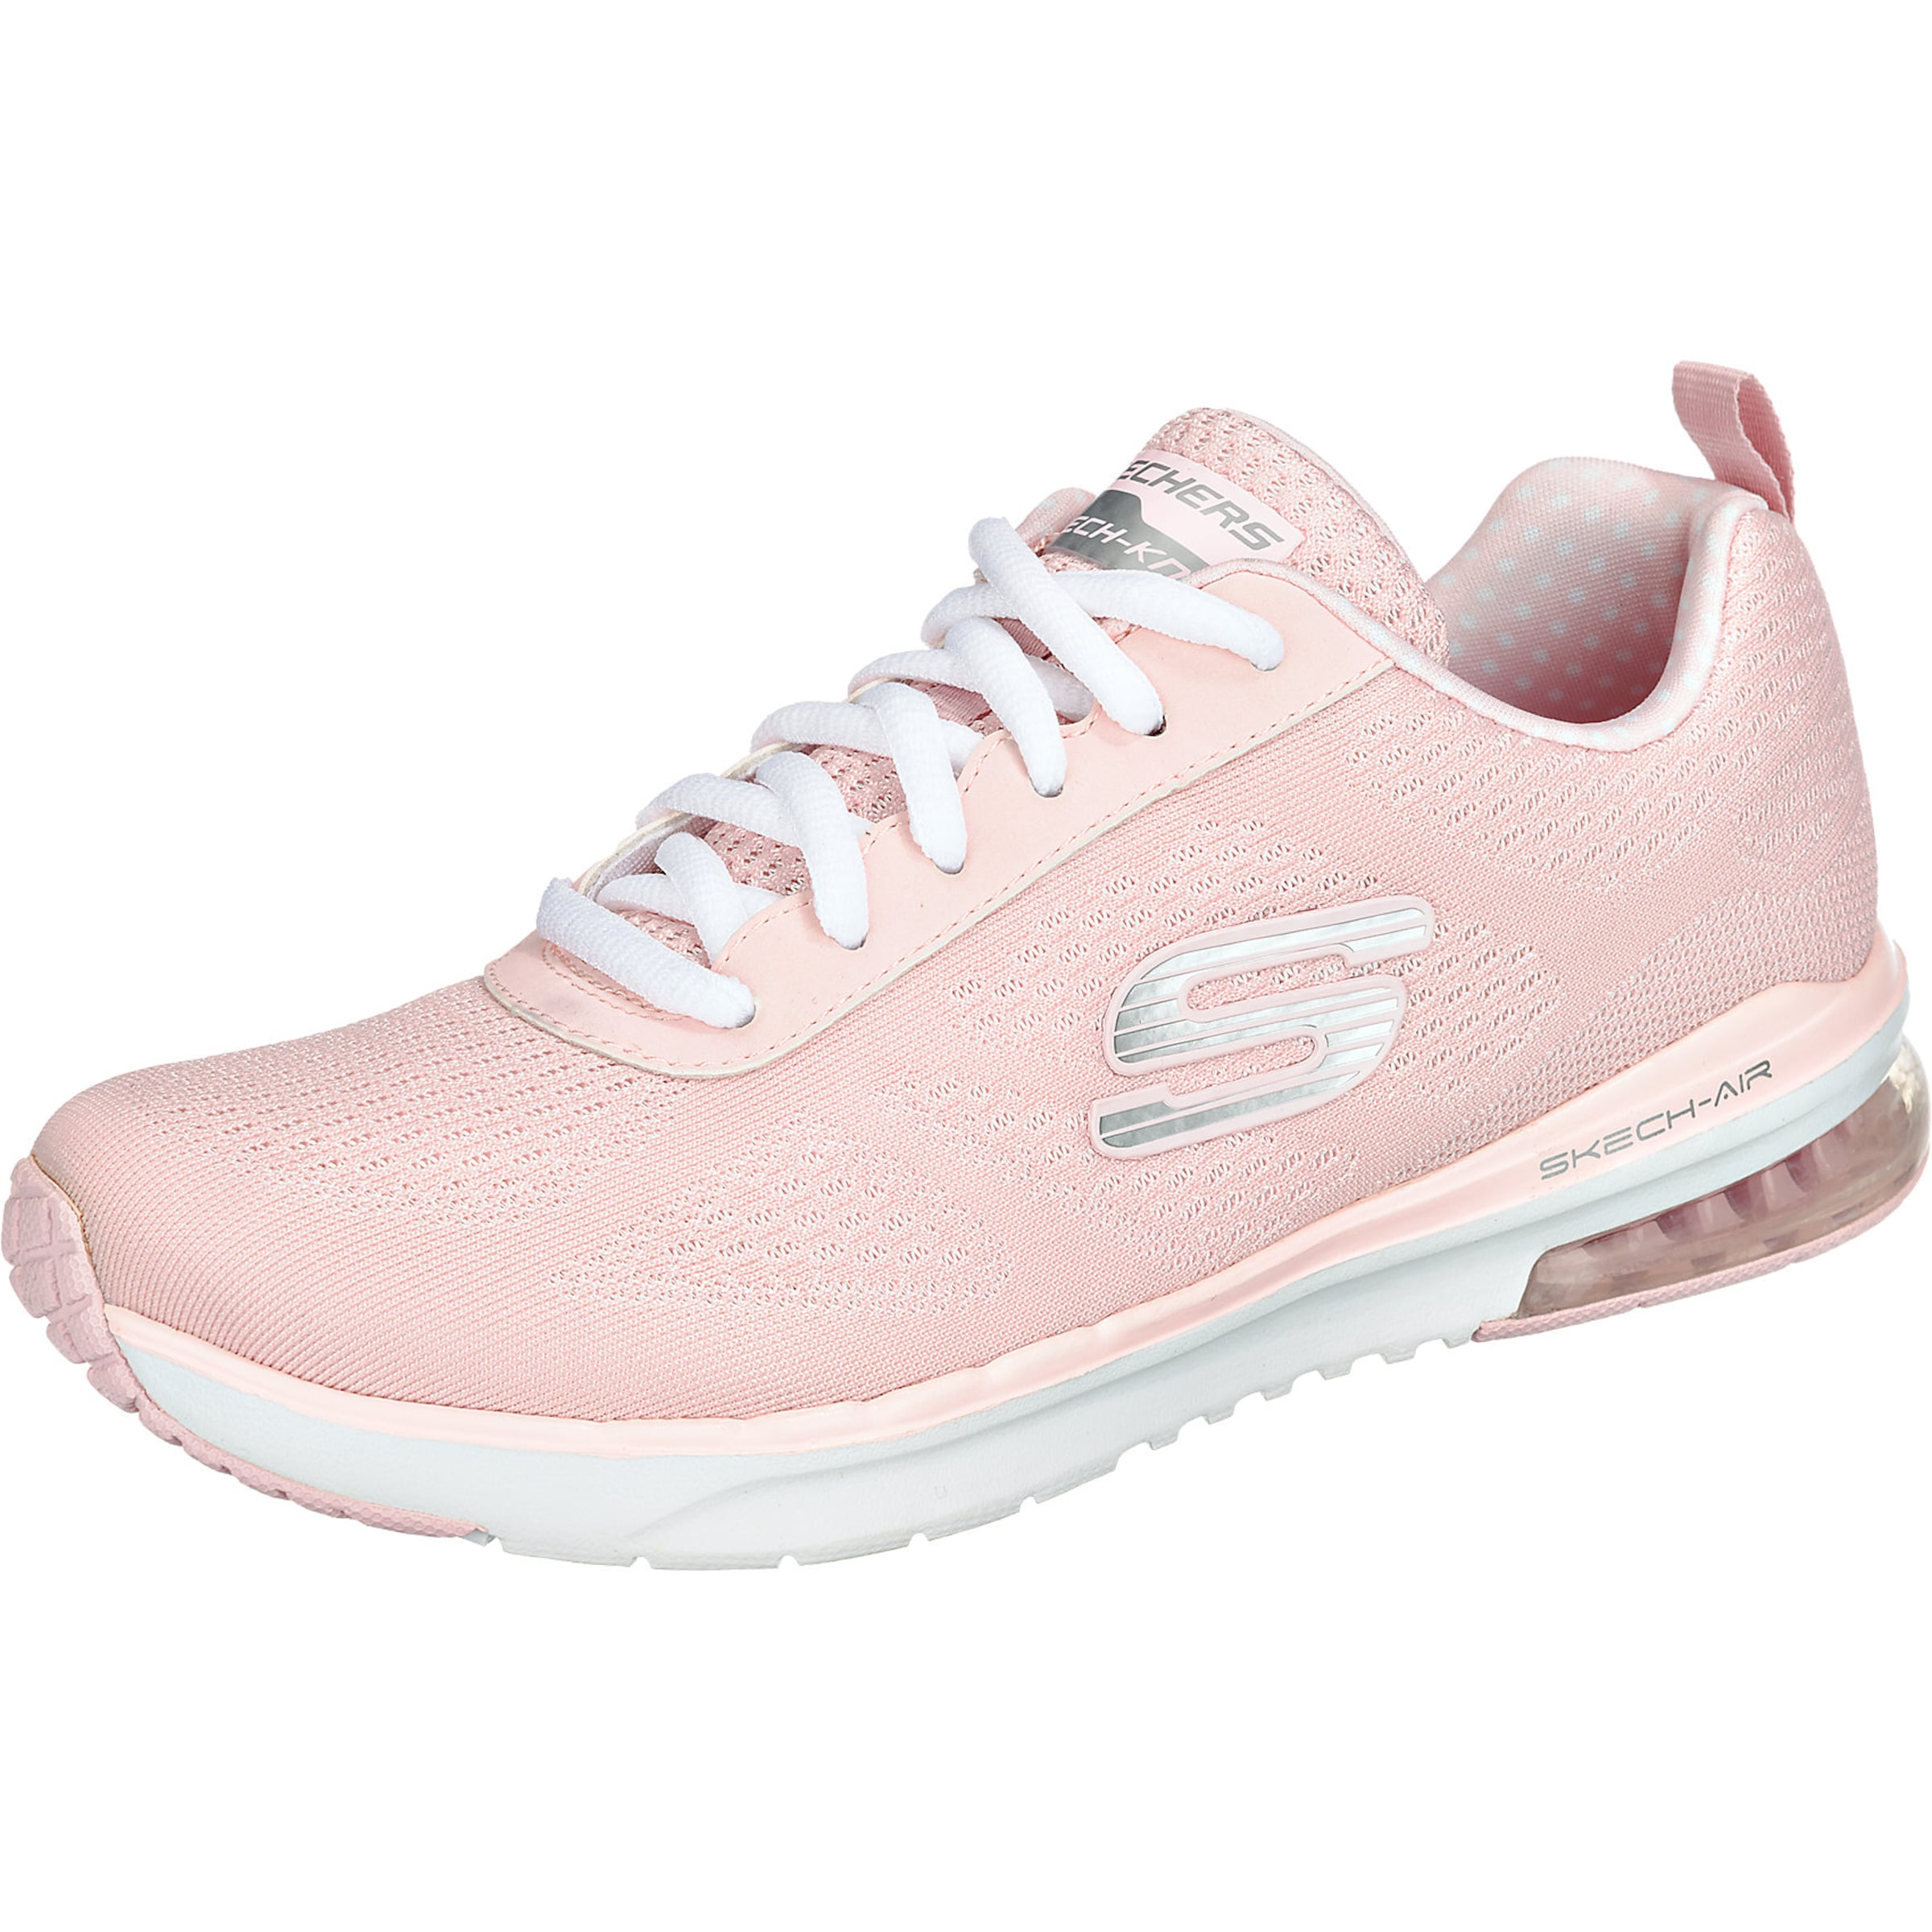 SKECHERS Sneaker Low Skech-Air infinity Hohe Qualität